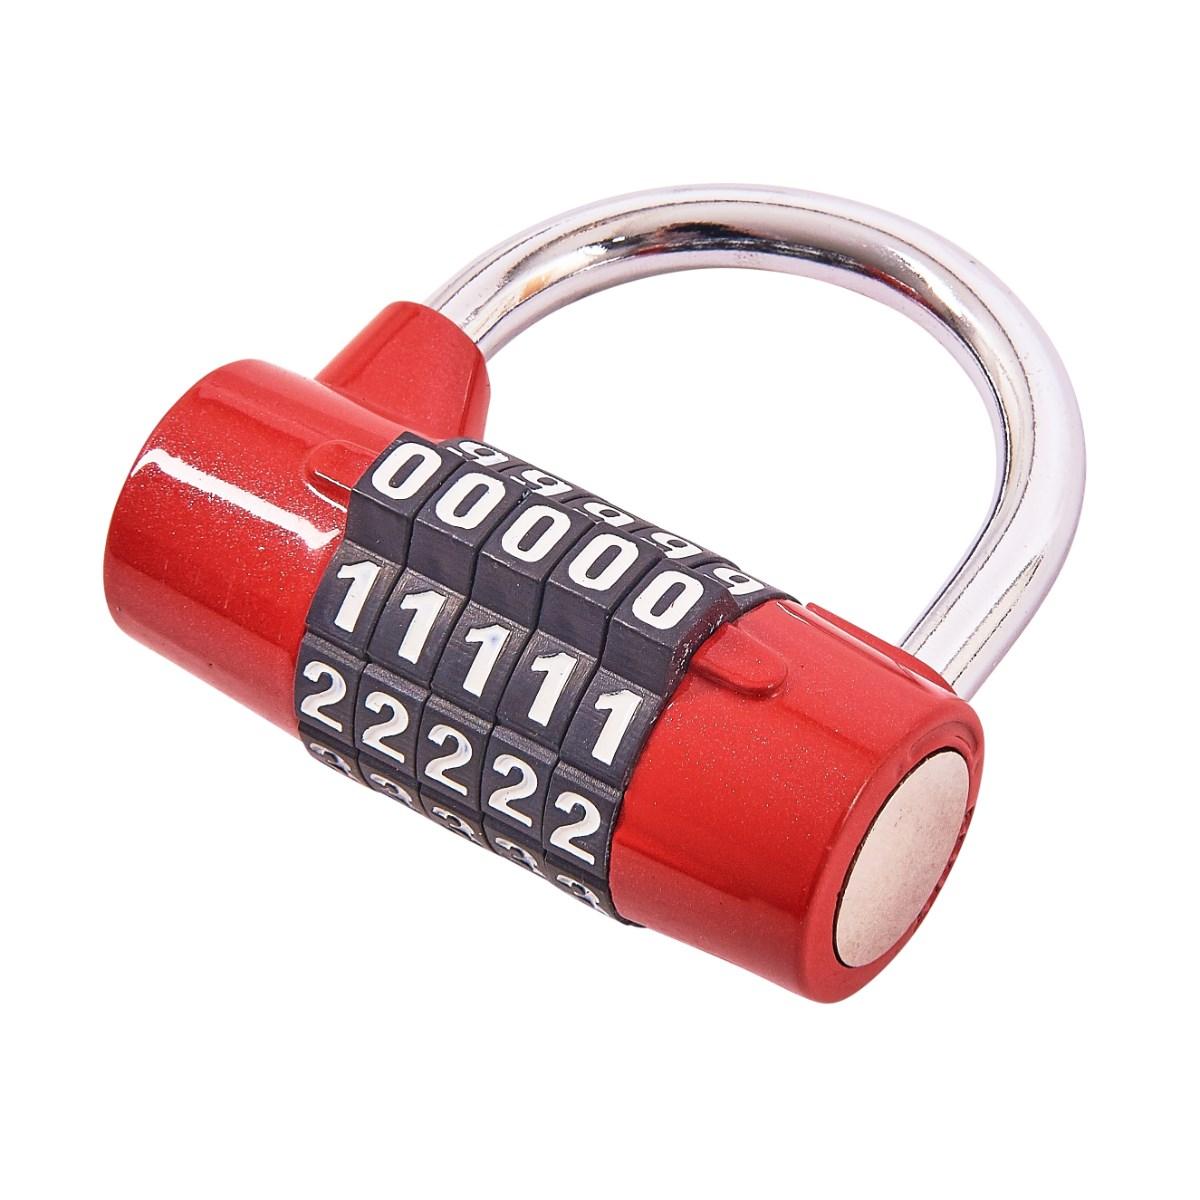 0ce2011131a6 5 digit combination padlock - Amtech